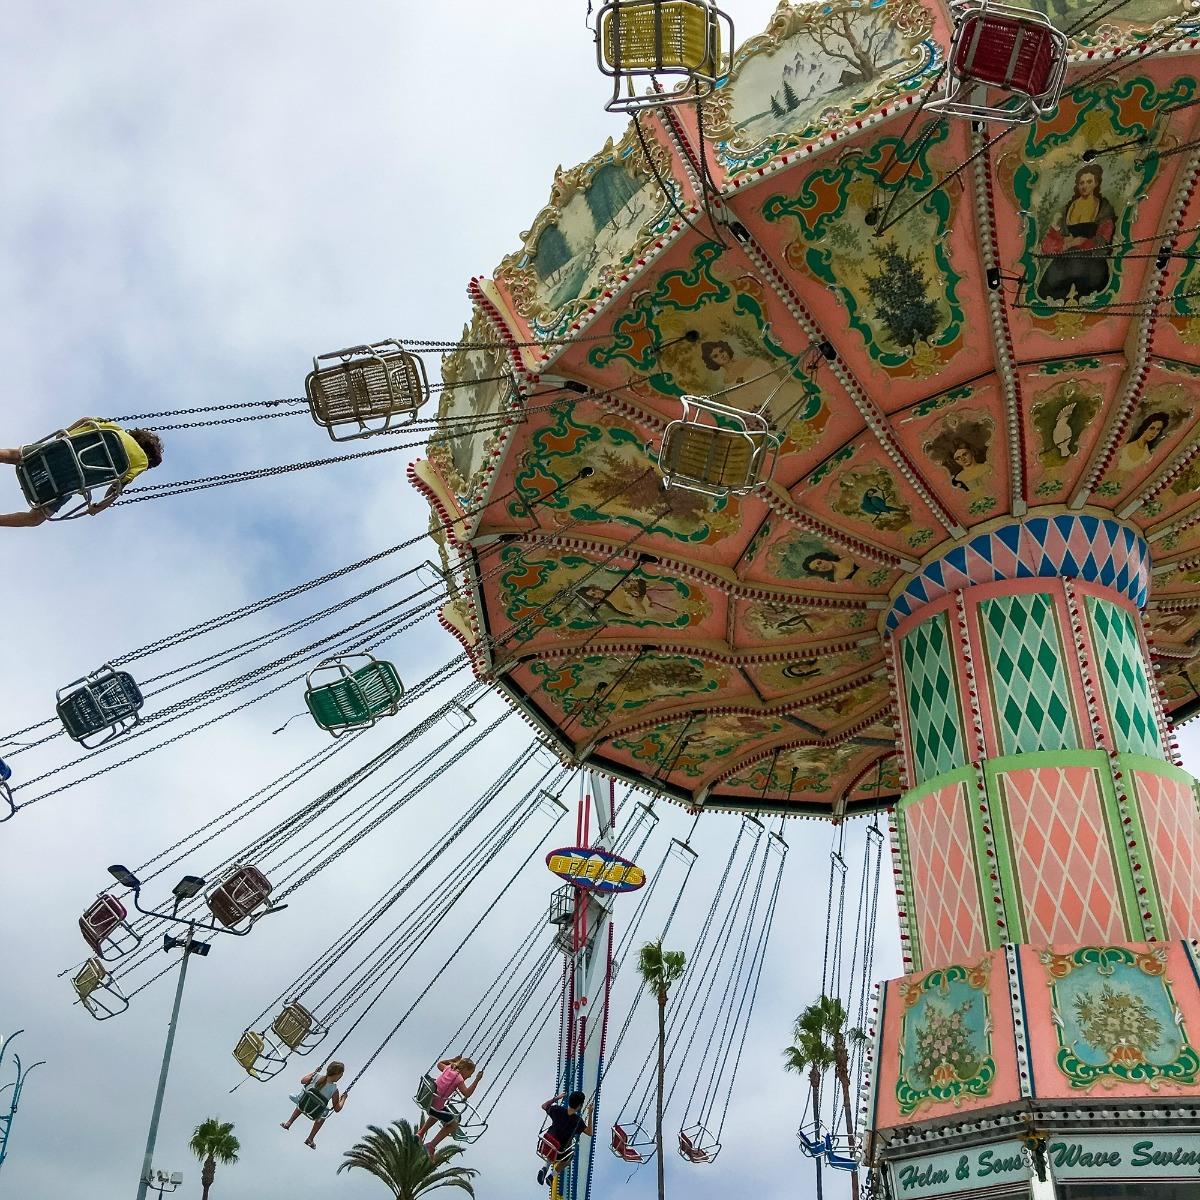 A thrill ride at the San Diego County Fair.